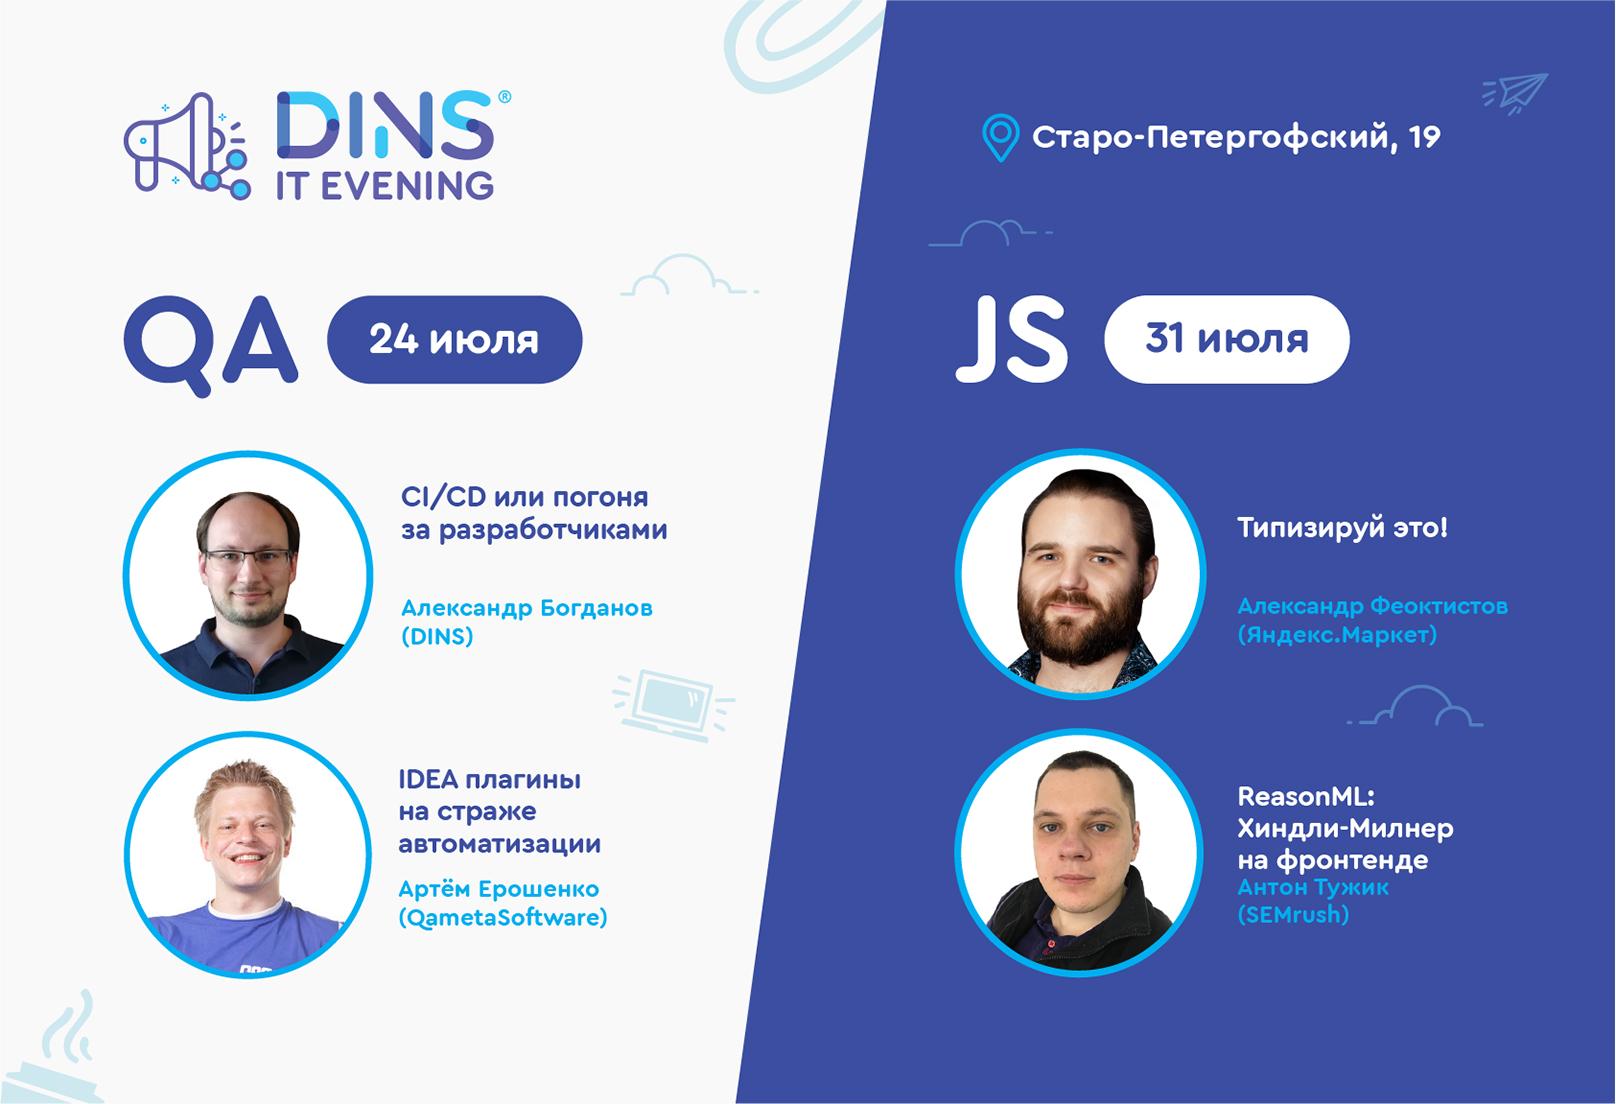 Приглашаем на DINS IT EVENING в июле: QA и JS